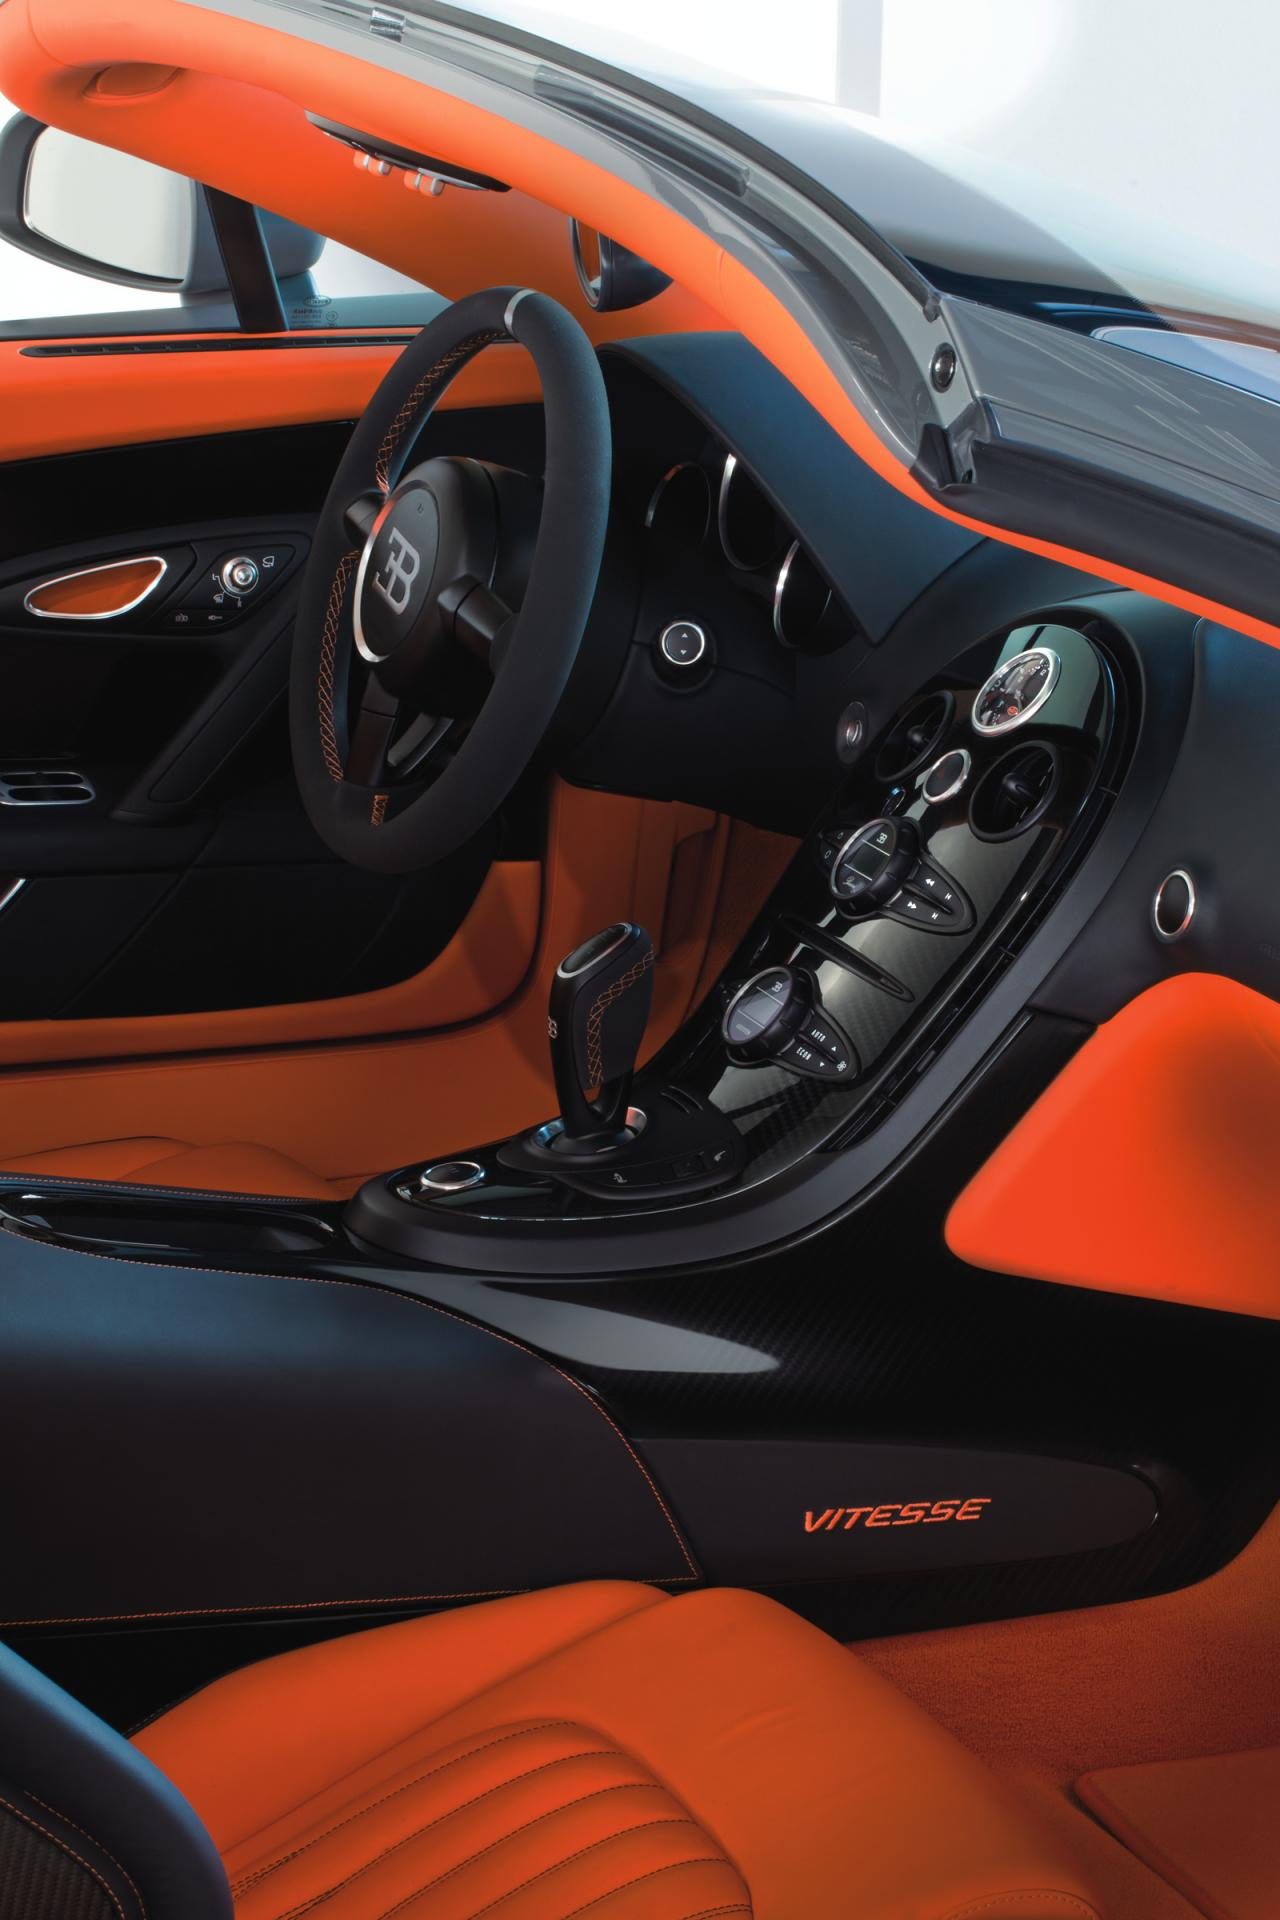 bugatti-veyron-grand-sport-vitesse-10 Extraordinary Bugatti Veyron Grand Sport Vitesse Real Racing 3 Cars Trend